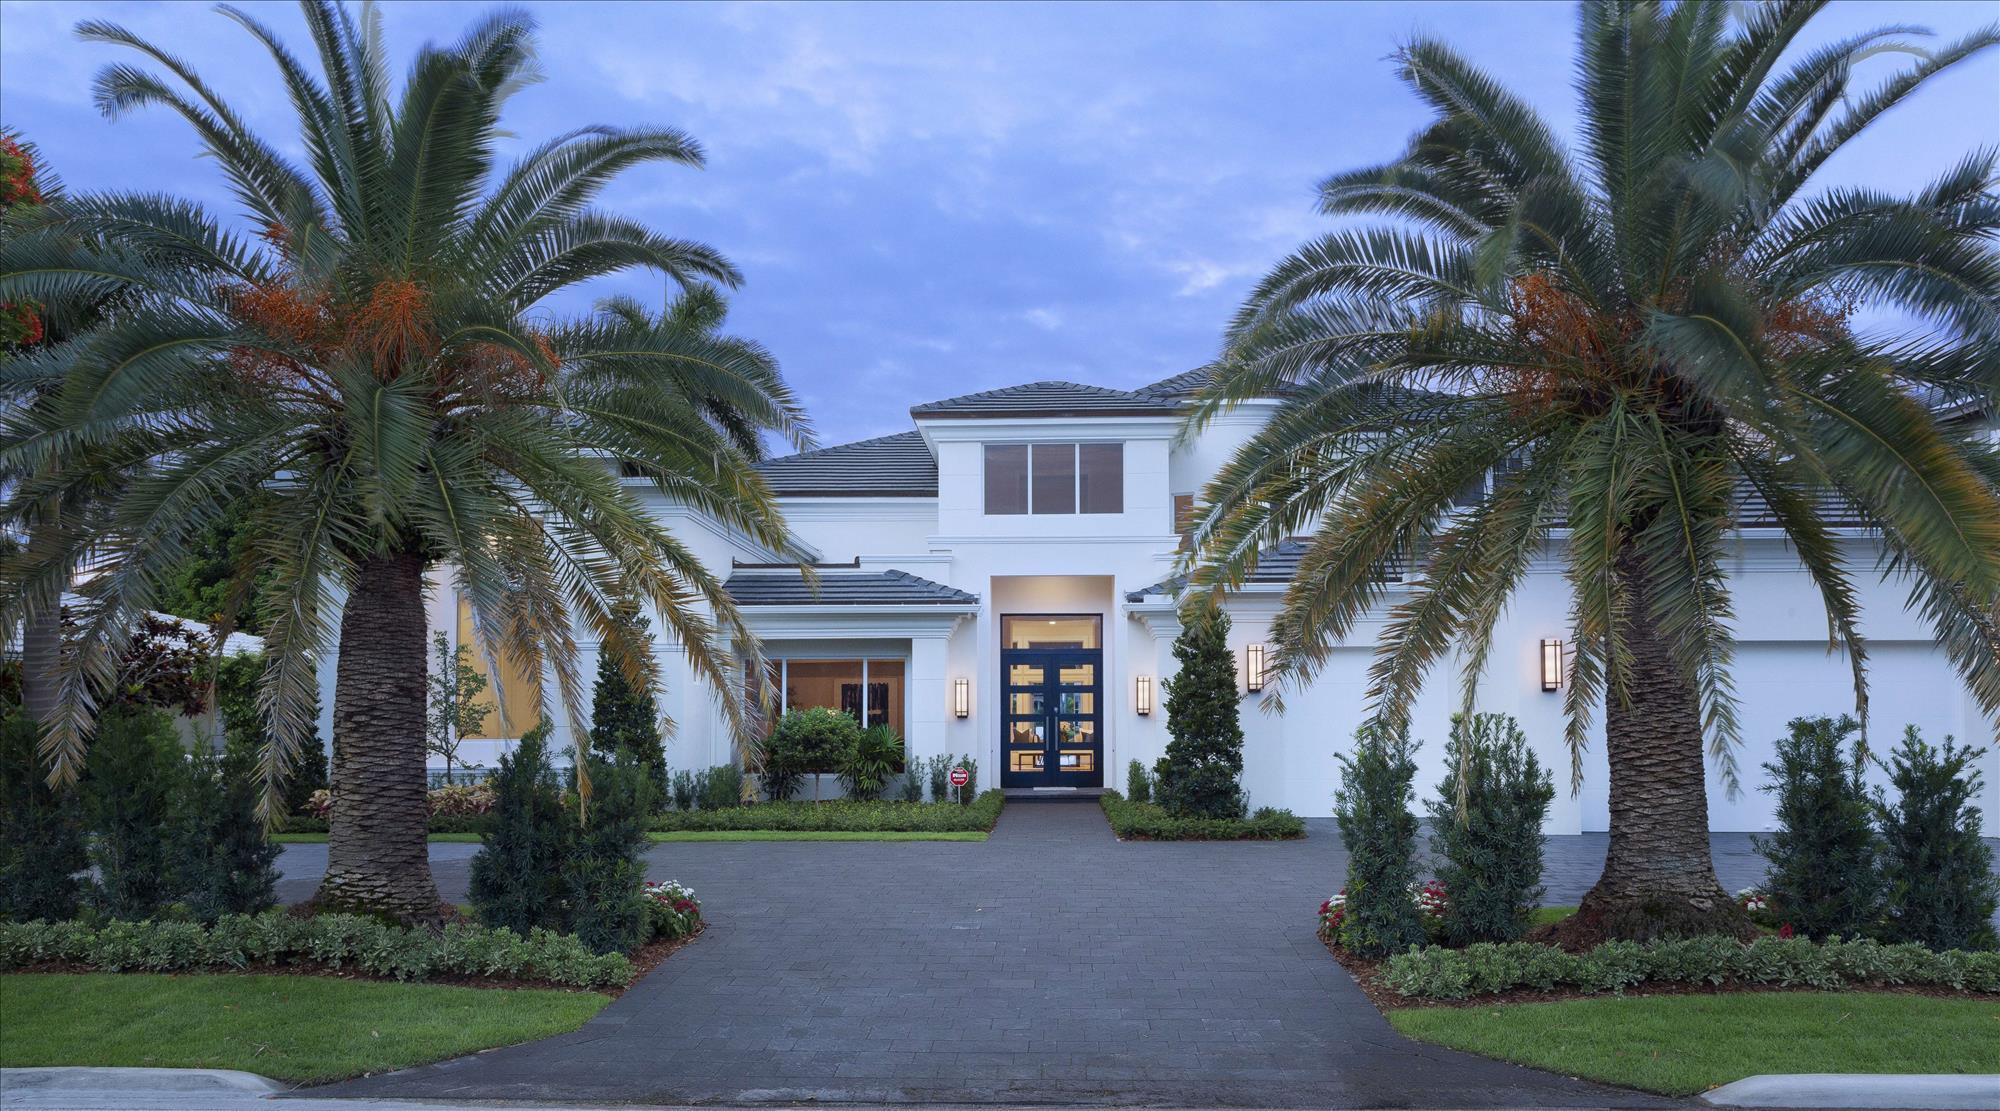 434 S Maya Palm Drive